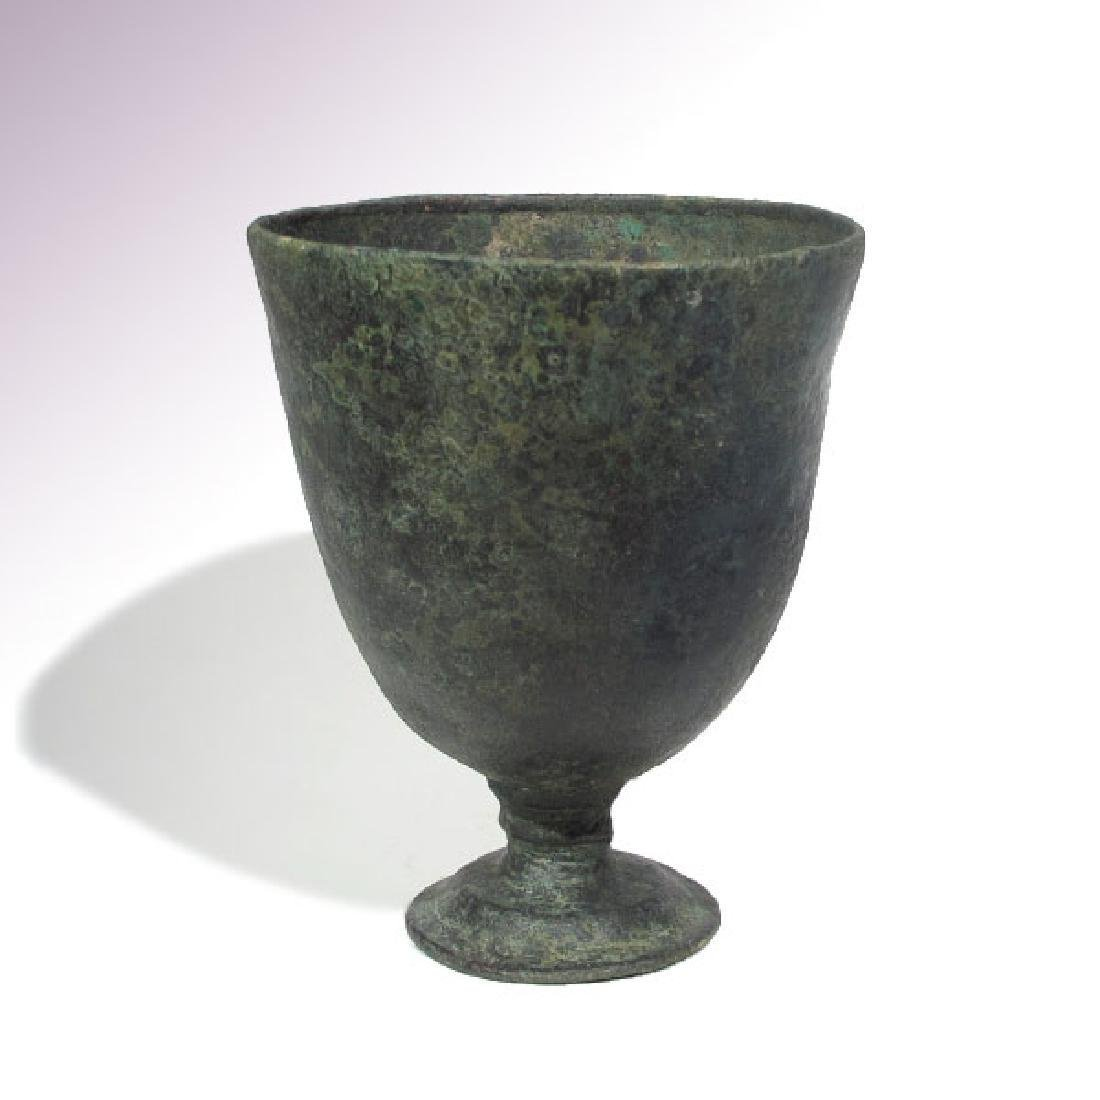 Elamite Large Bronze Stemmed Drinking Cup, 1800-1500 BC